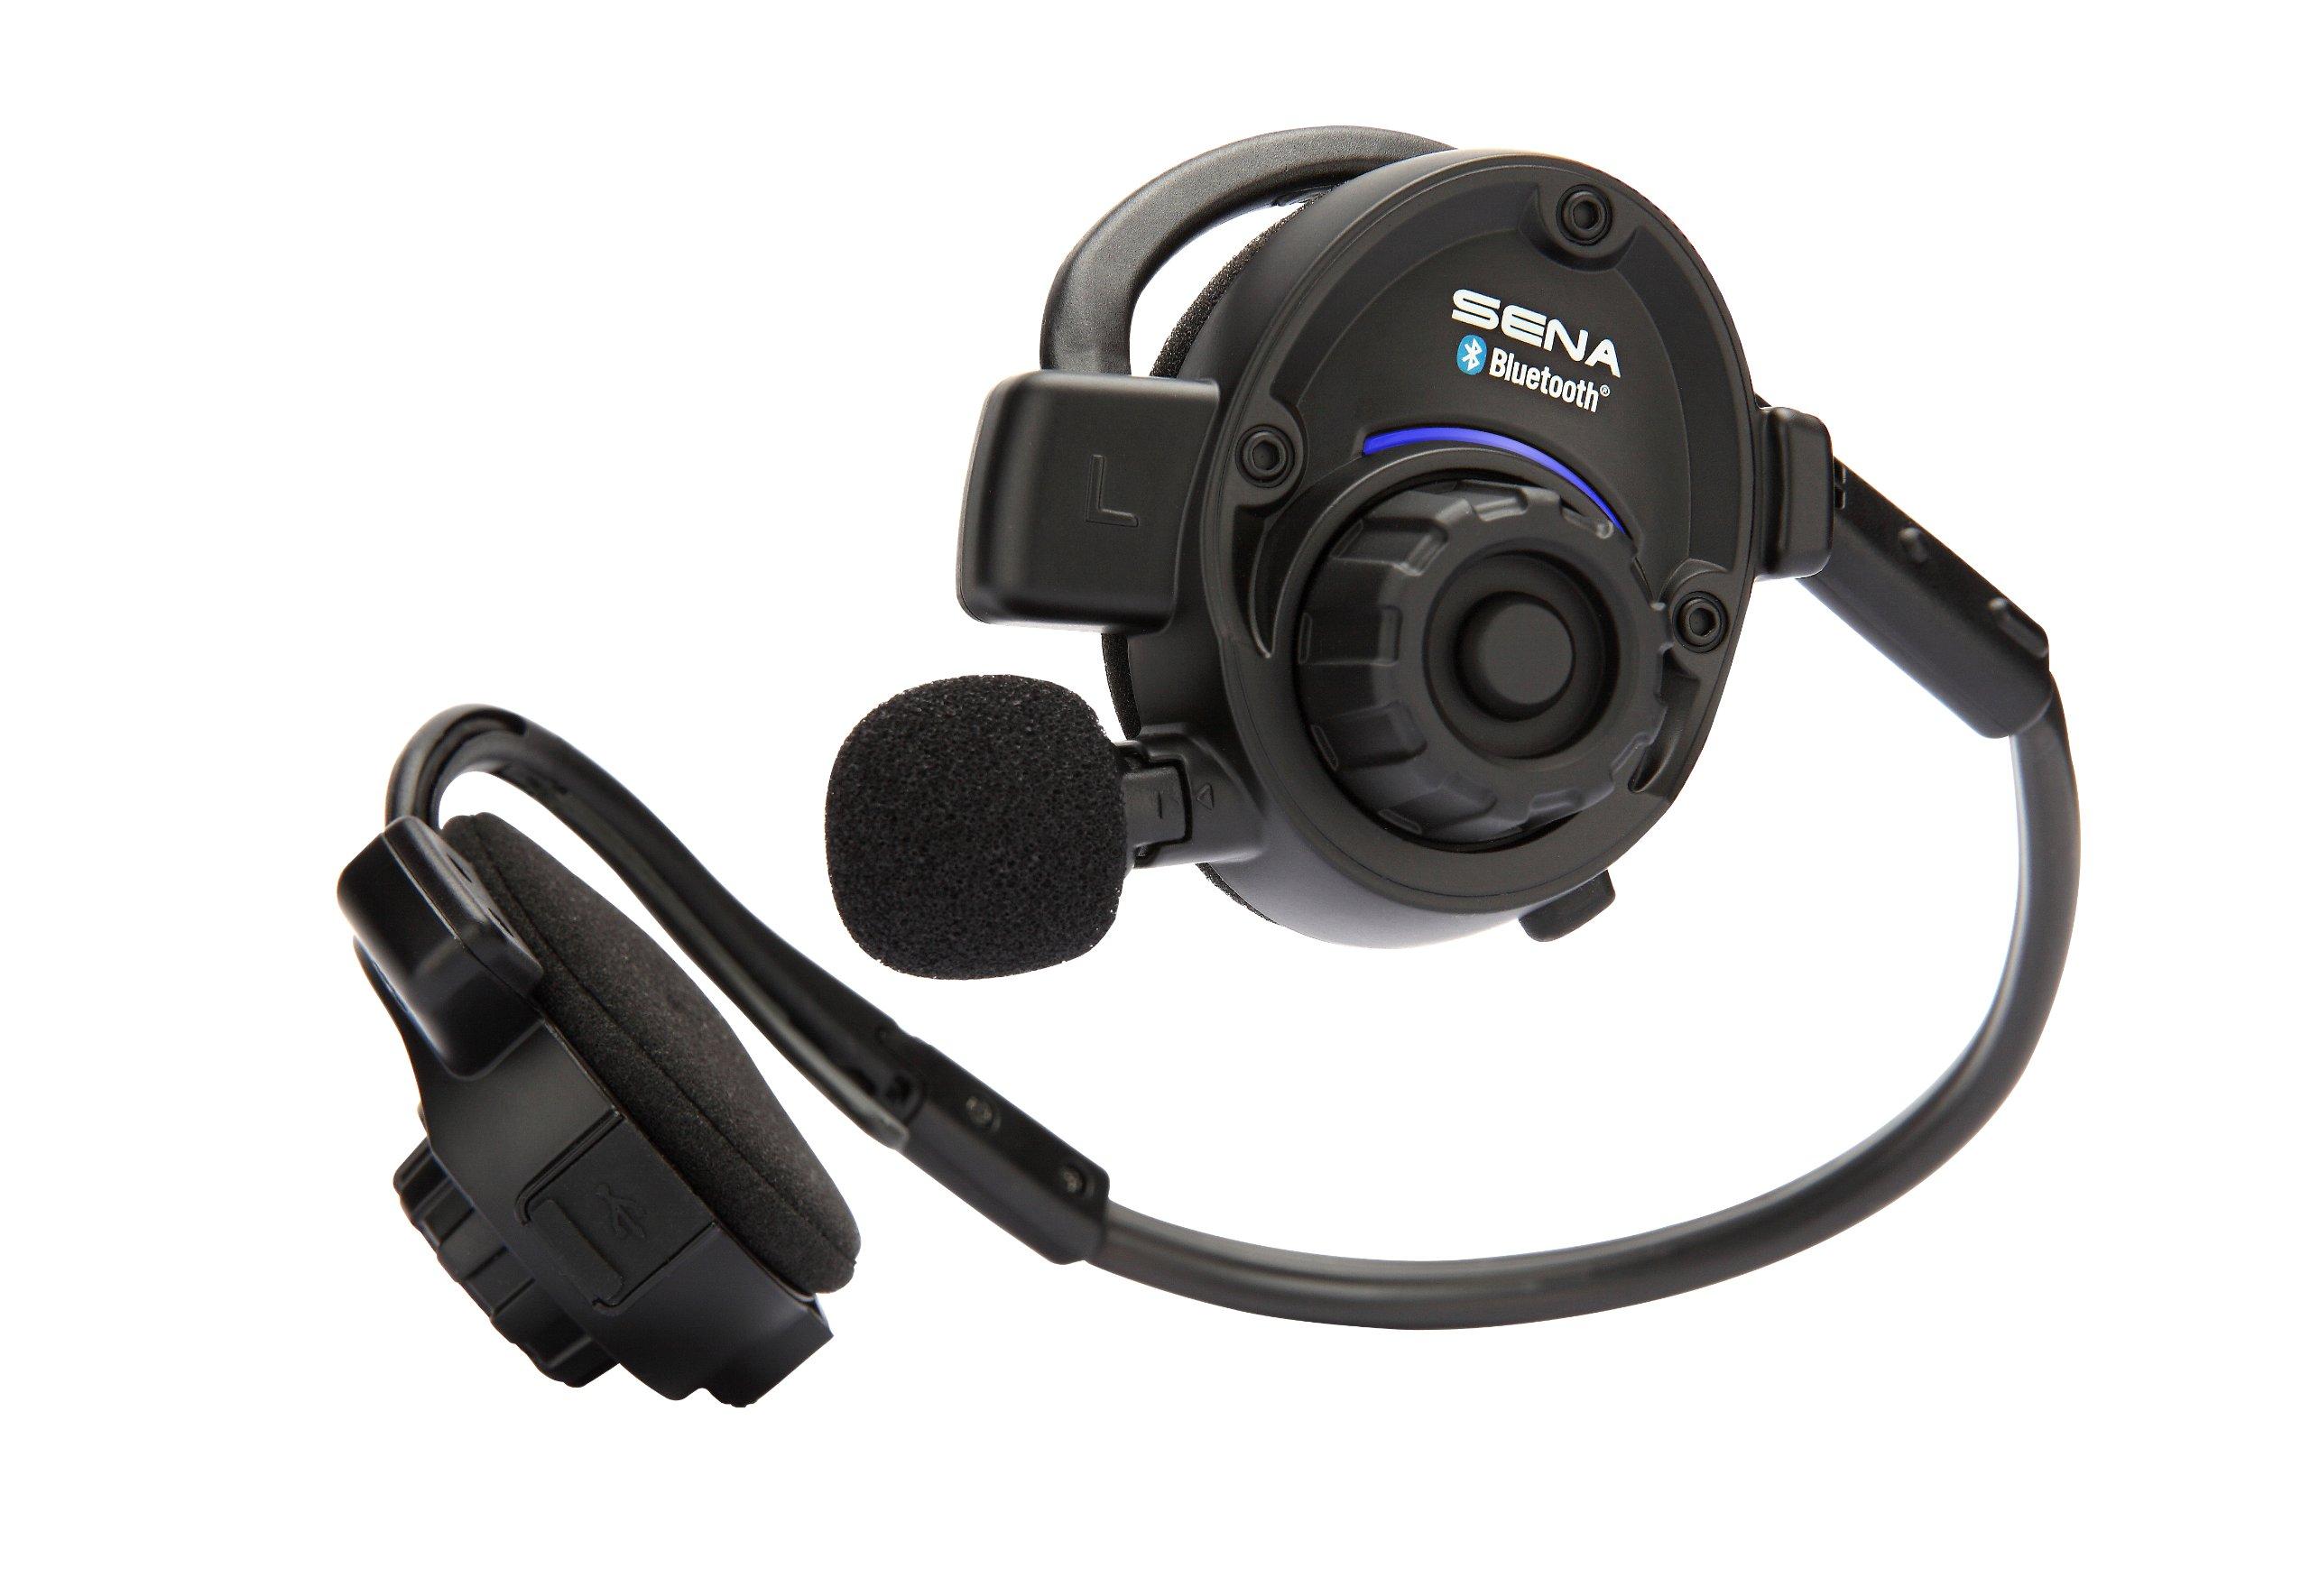 Sena SPH10-10 Outdoor Sports Bluetooth Stereo Headset / Intercom by Sena (Image #5)